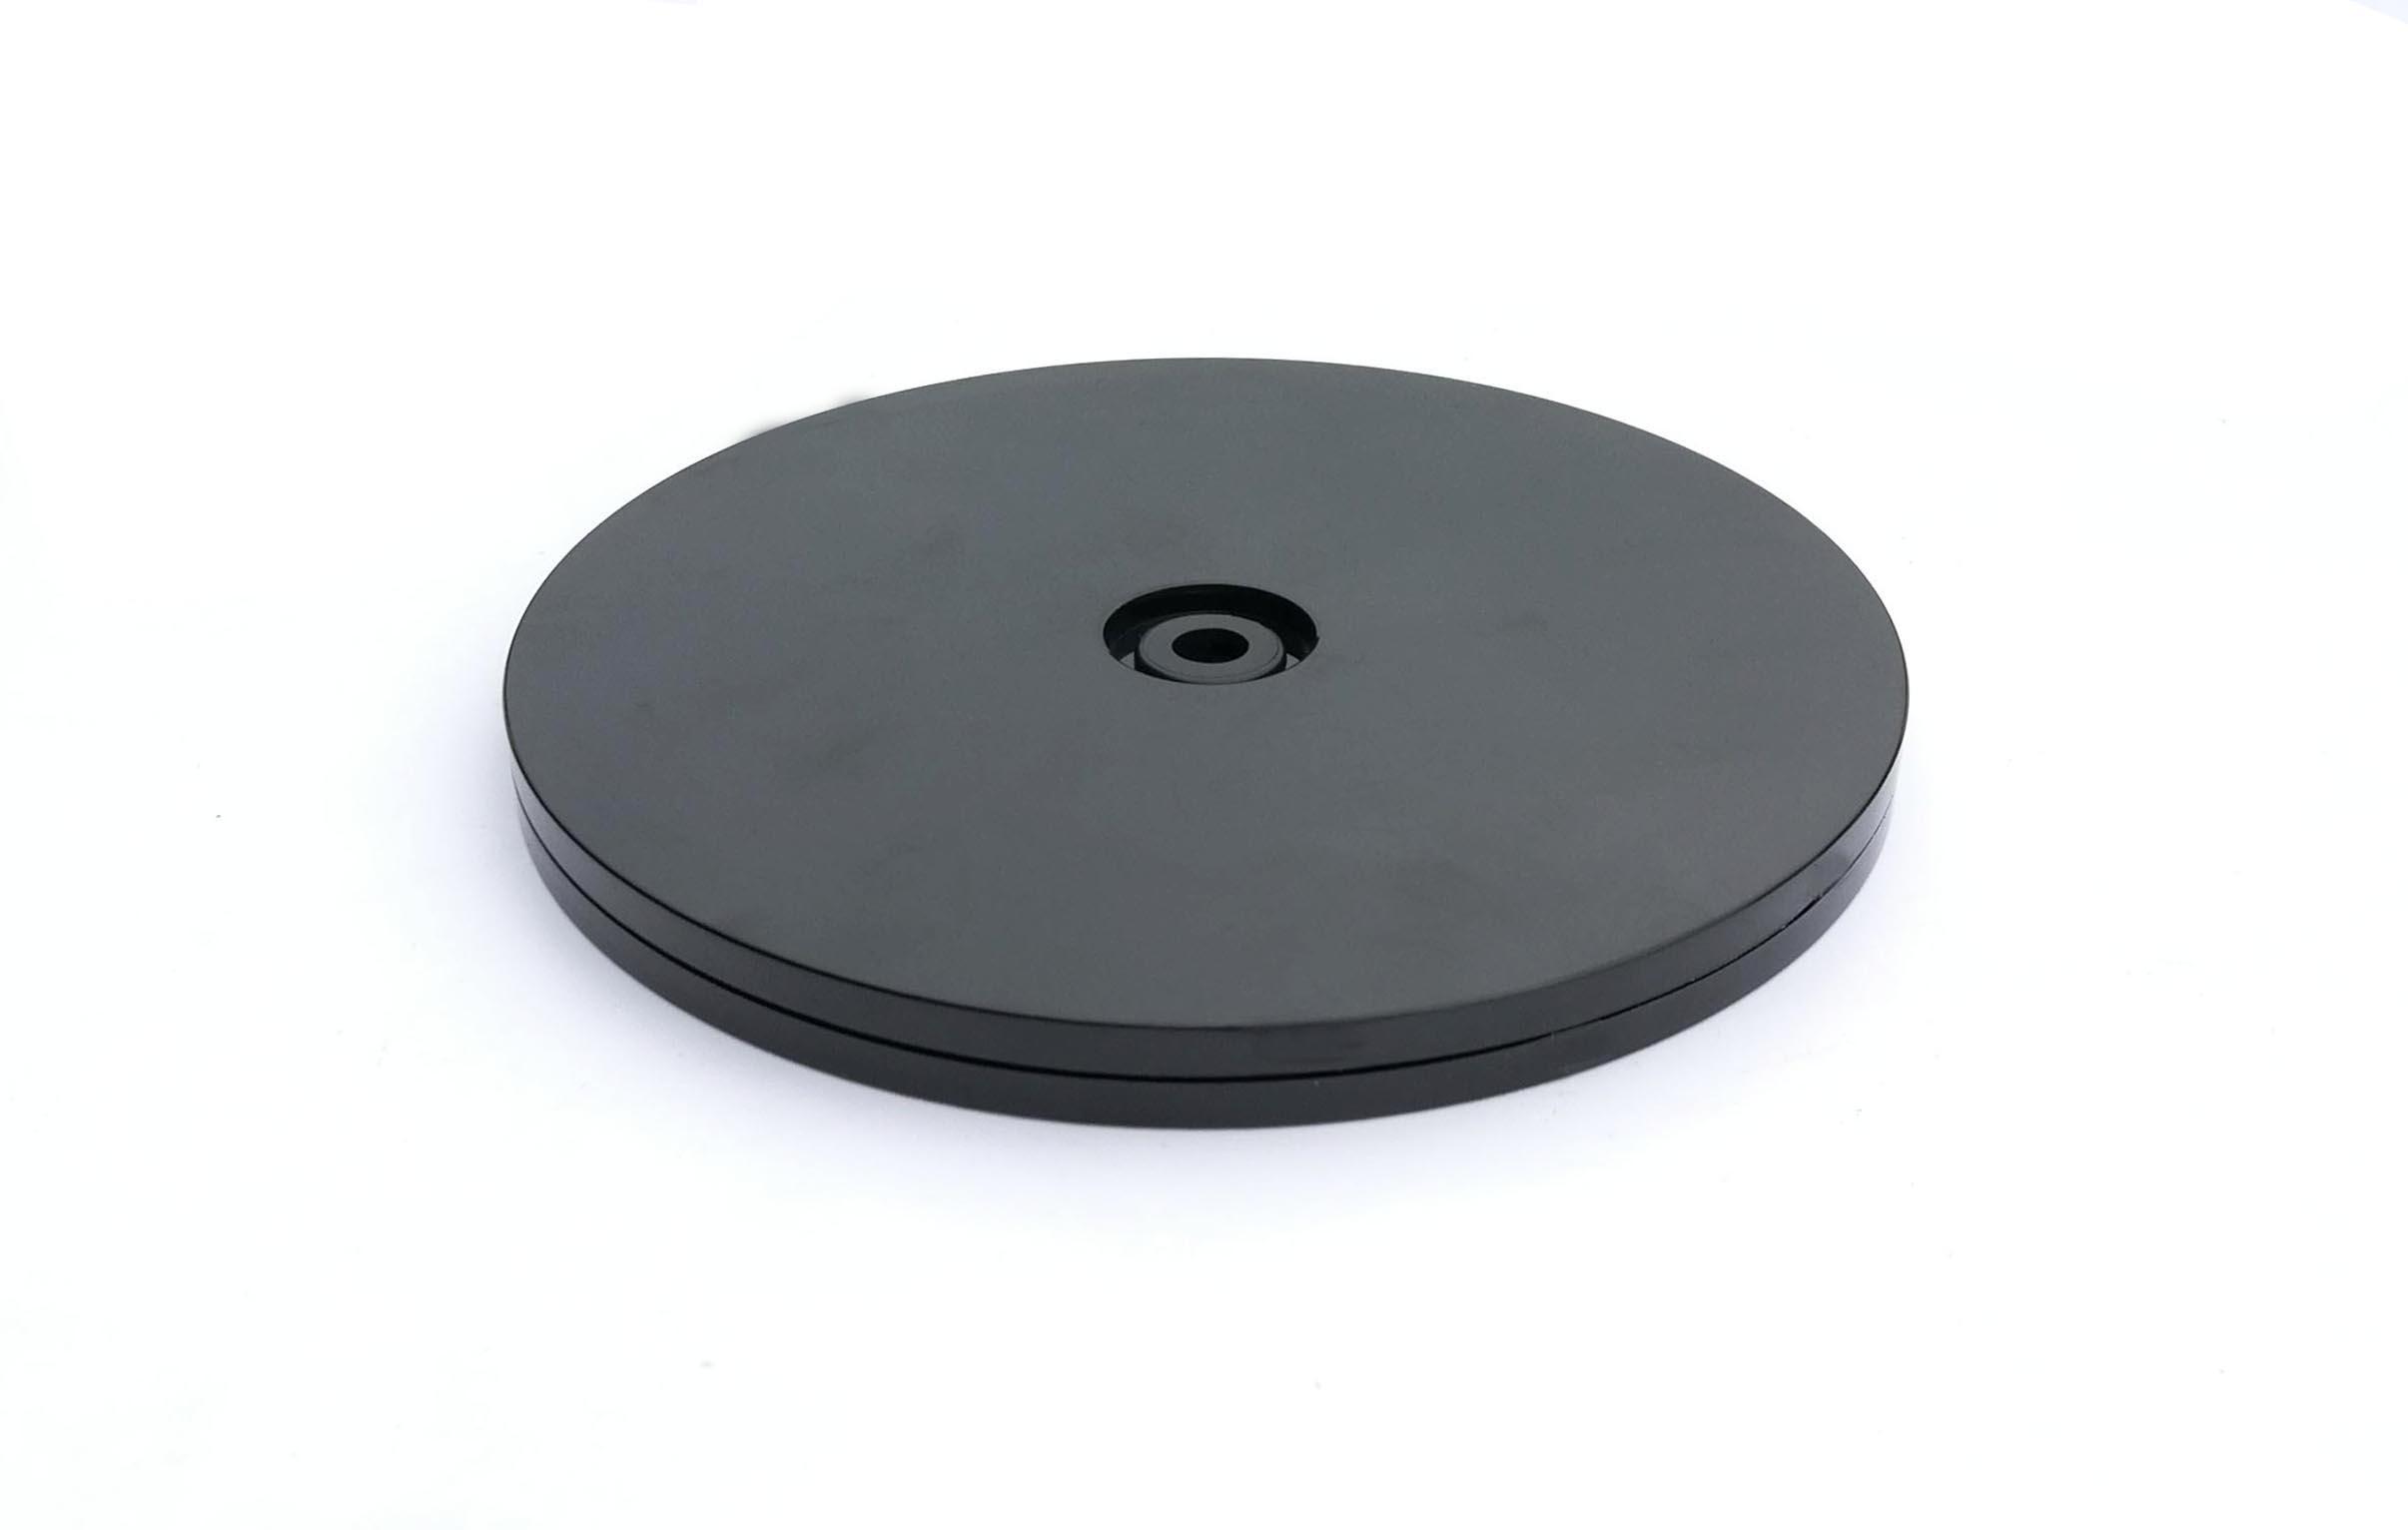 Fixturedisplays 8 Black Plastic Spinner Lazy Susan Turntable Organizer For E Rack Table Cake Kitchen